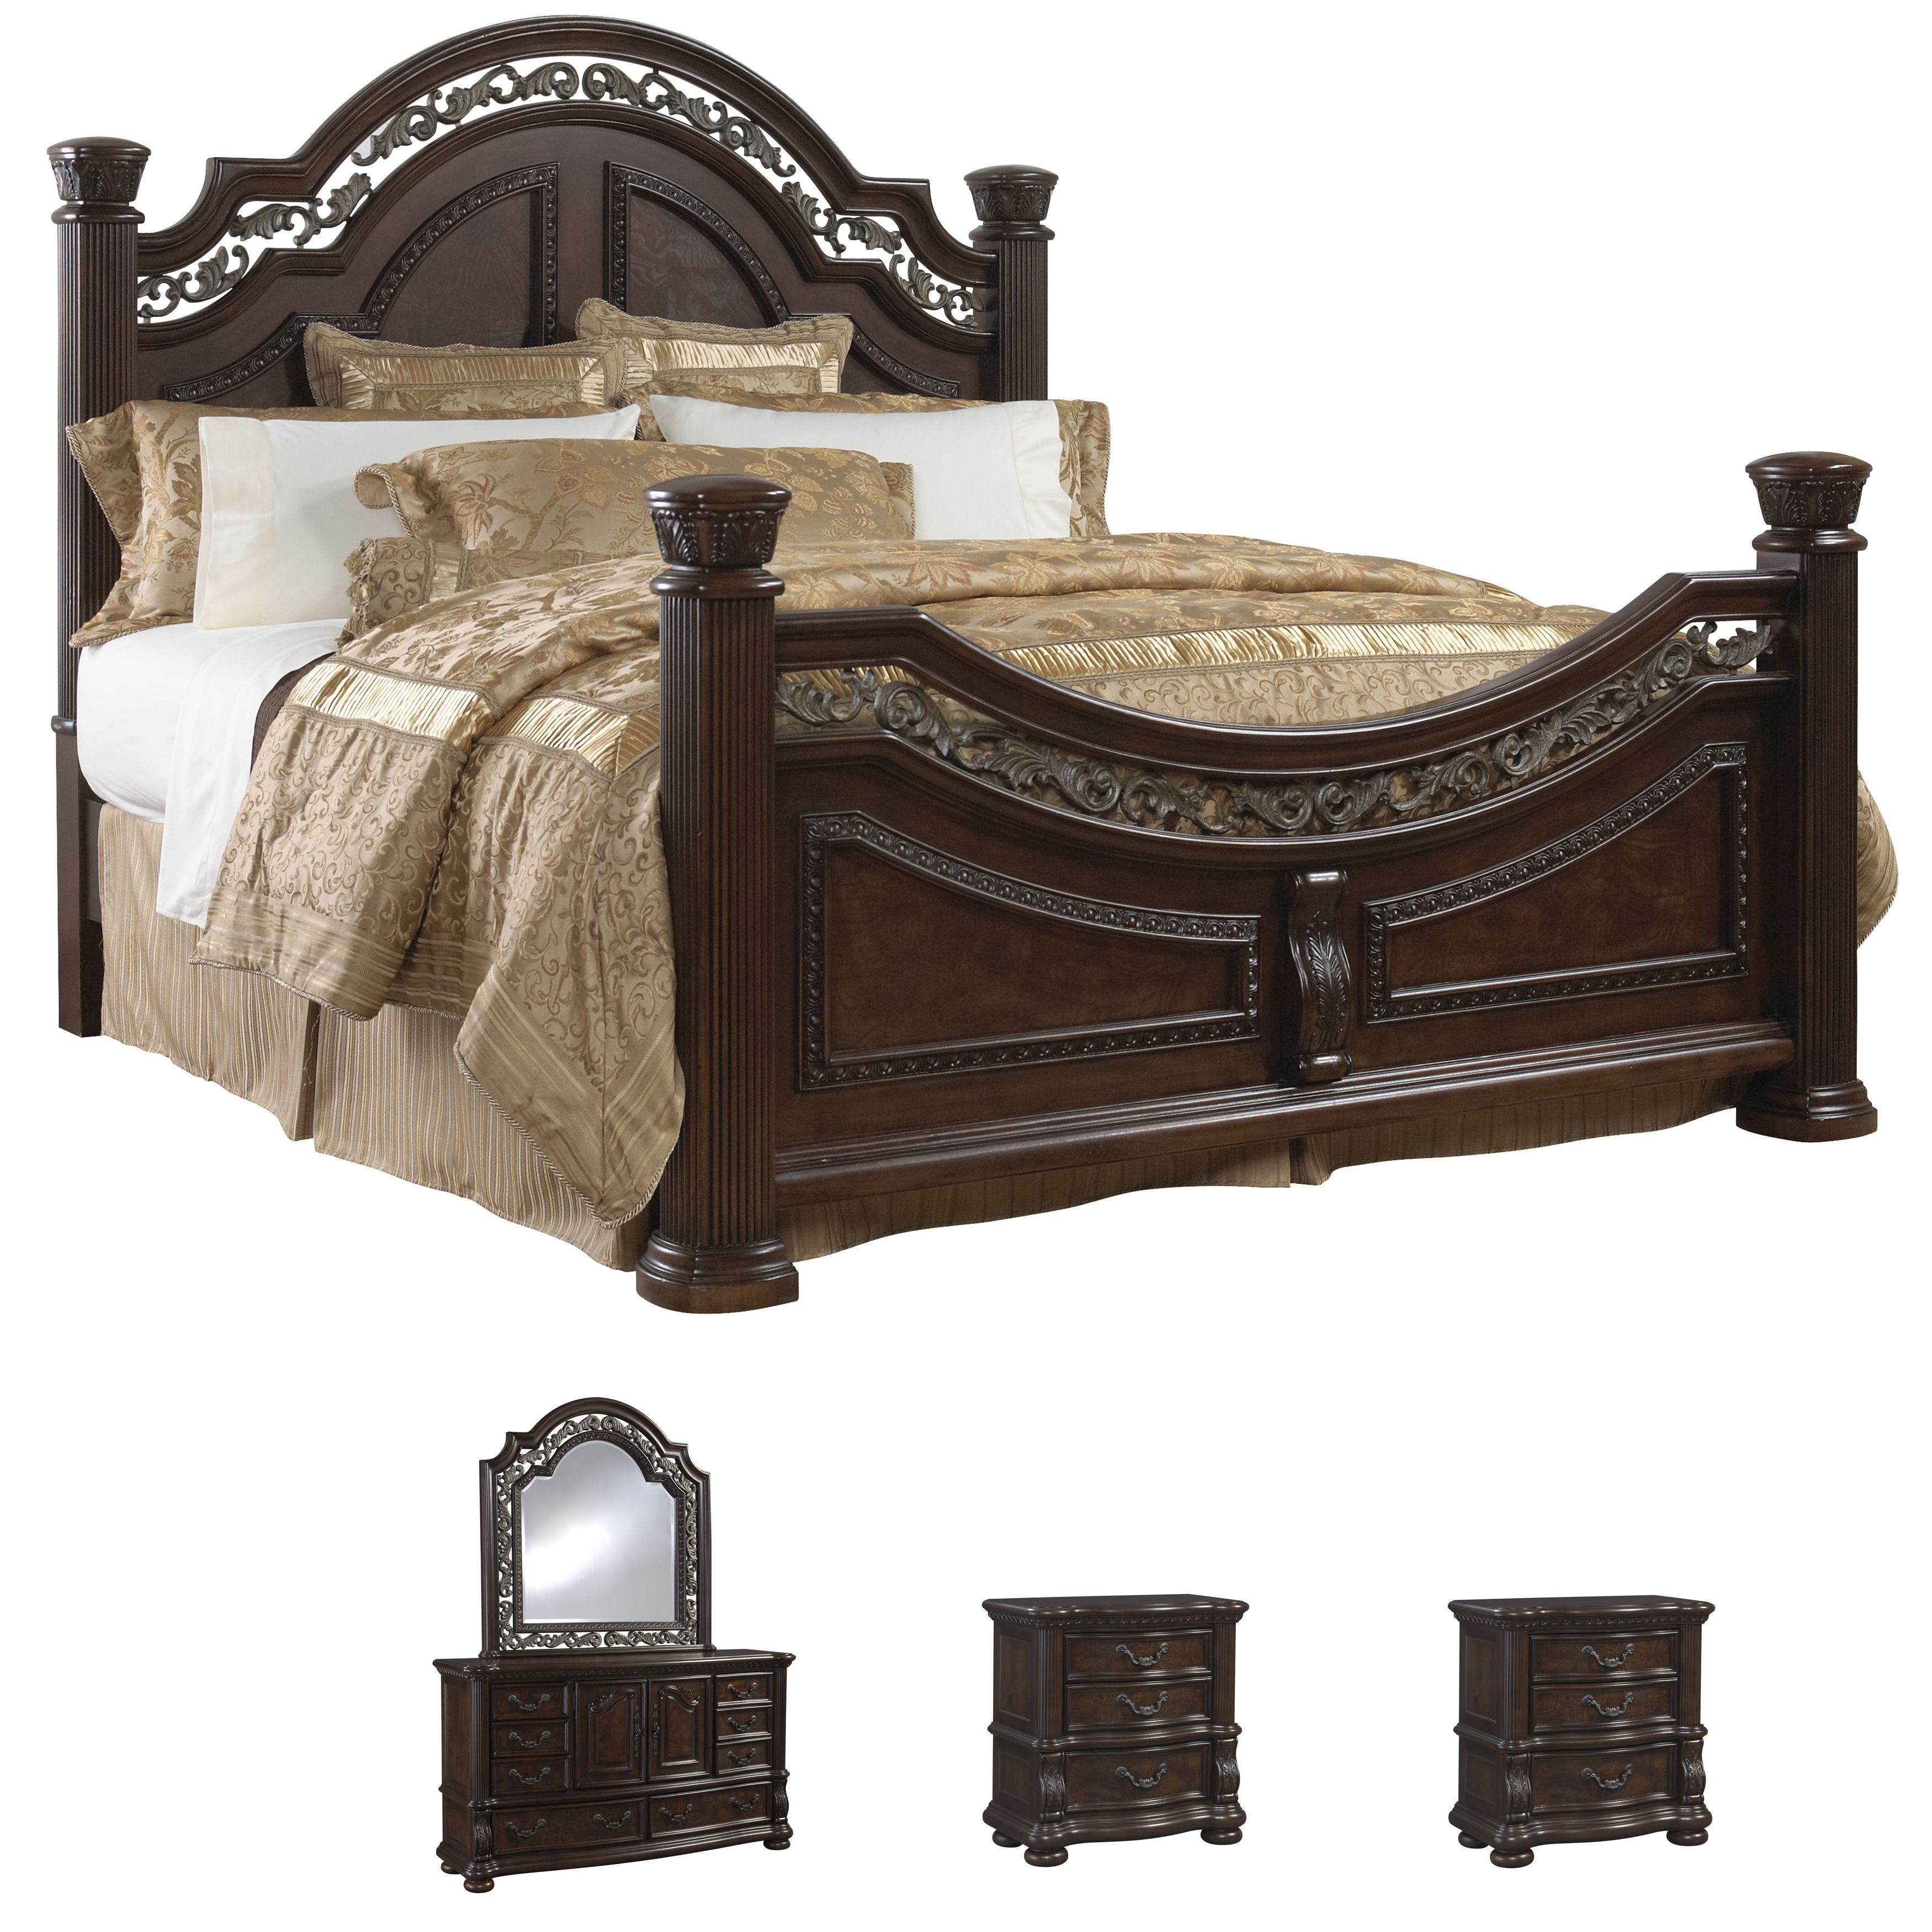 Tuscany 5 piece mocha finish king size bedroom set king - King size bedroom set with mattress ...